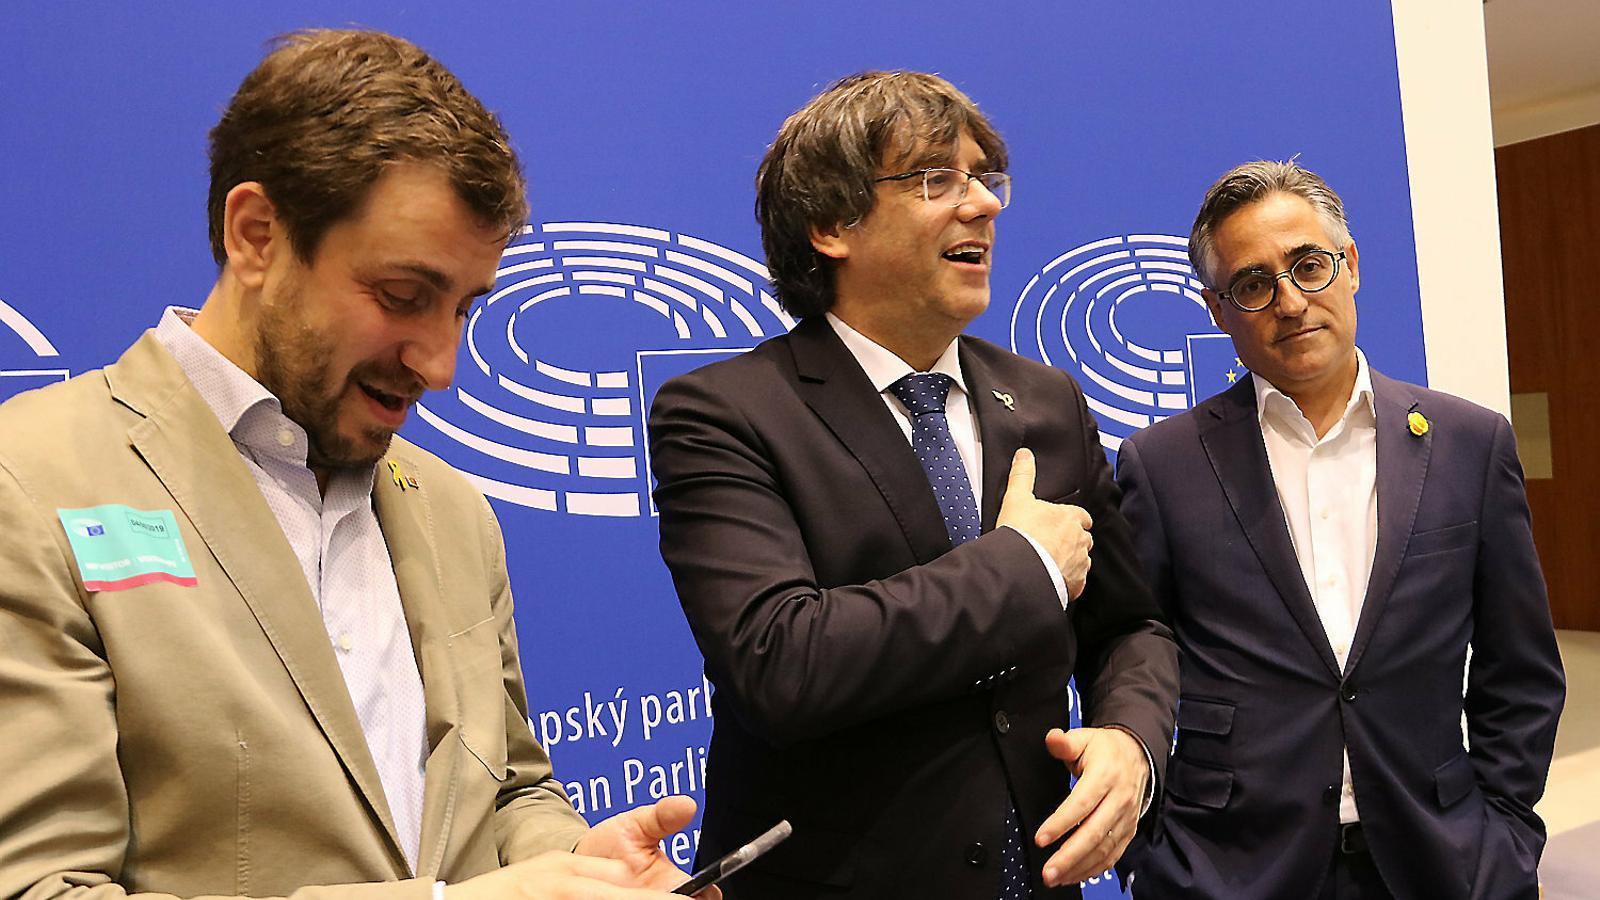 Puigdemont i Comín ahir dins del Parlament Europeu.